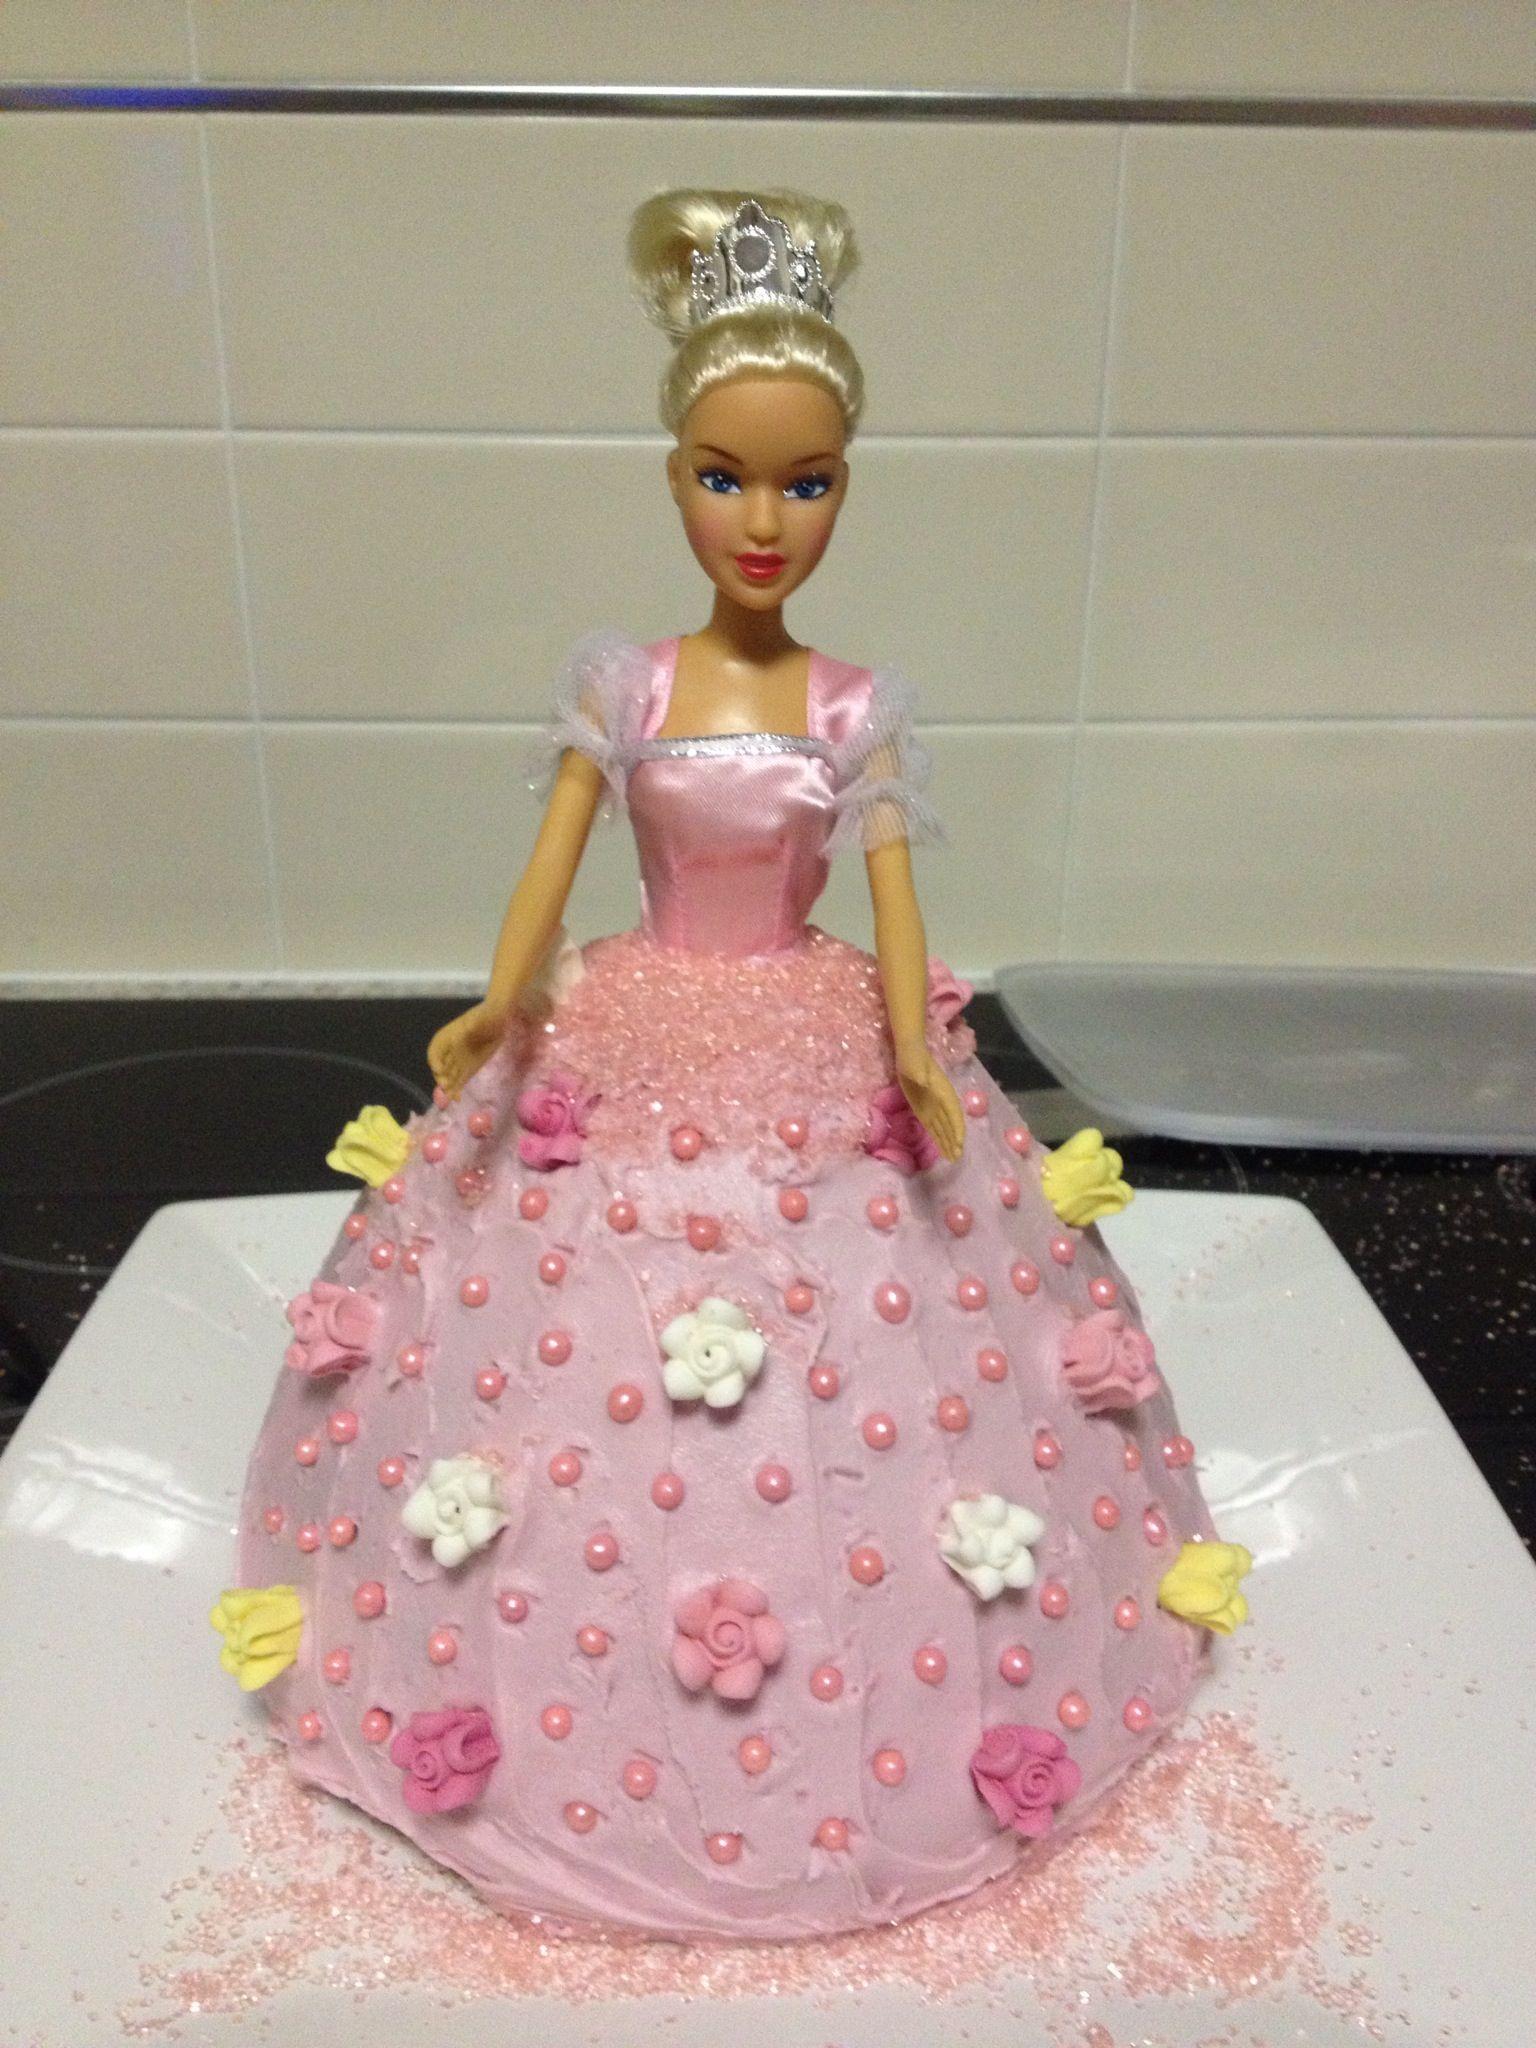 Dolly Varden Tin Butter Cake Betty Crocker Pink Icing